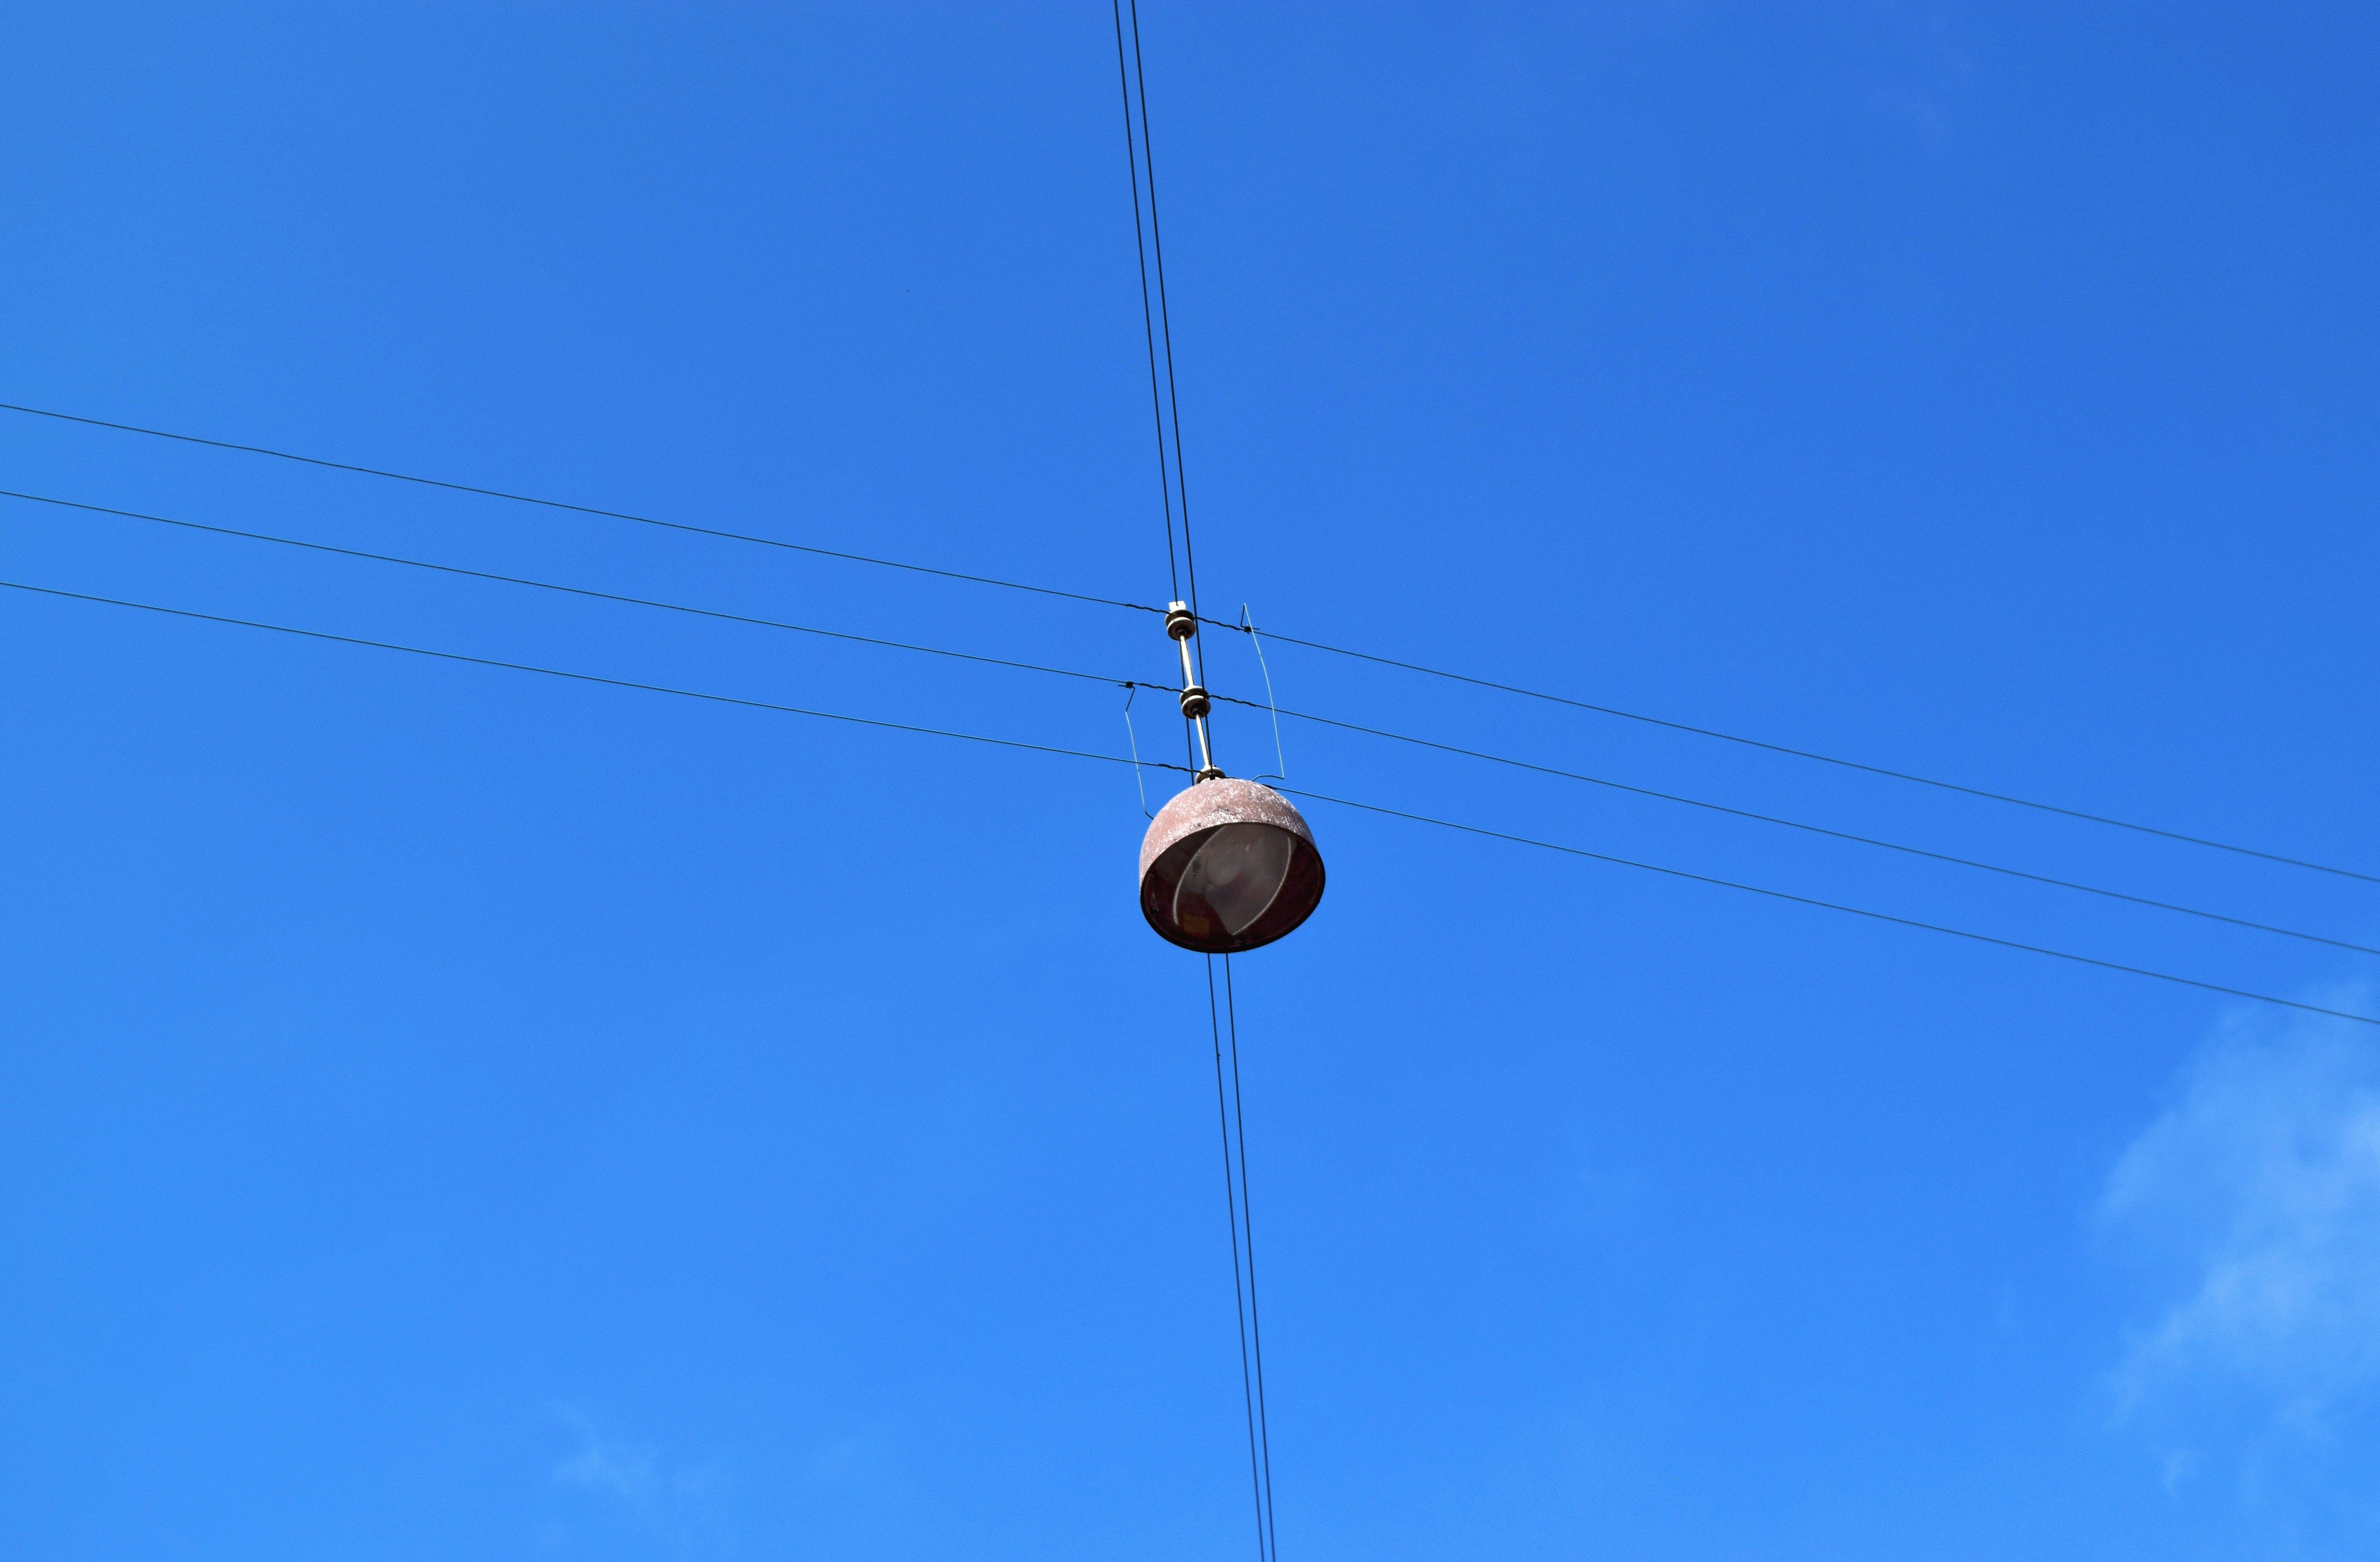 Free stock photo of sky, street lamps, kobenhavnerlamper, copenhagen lamps